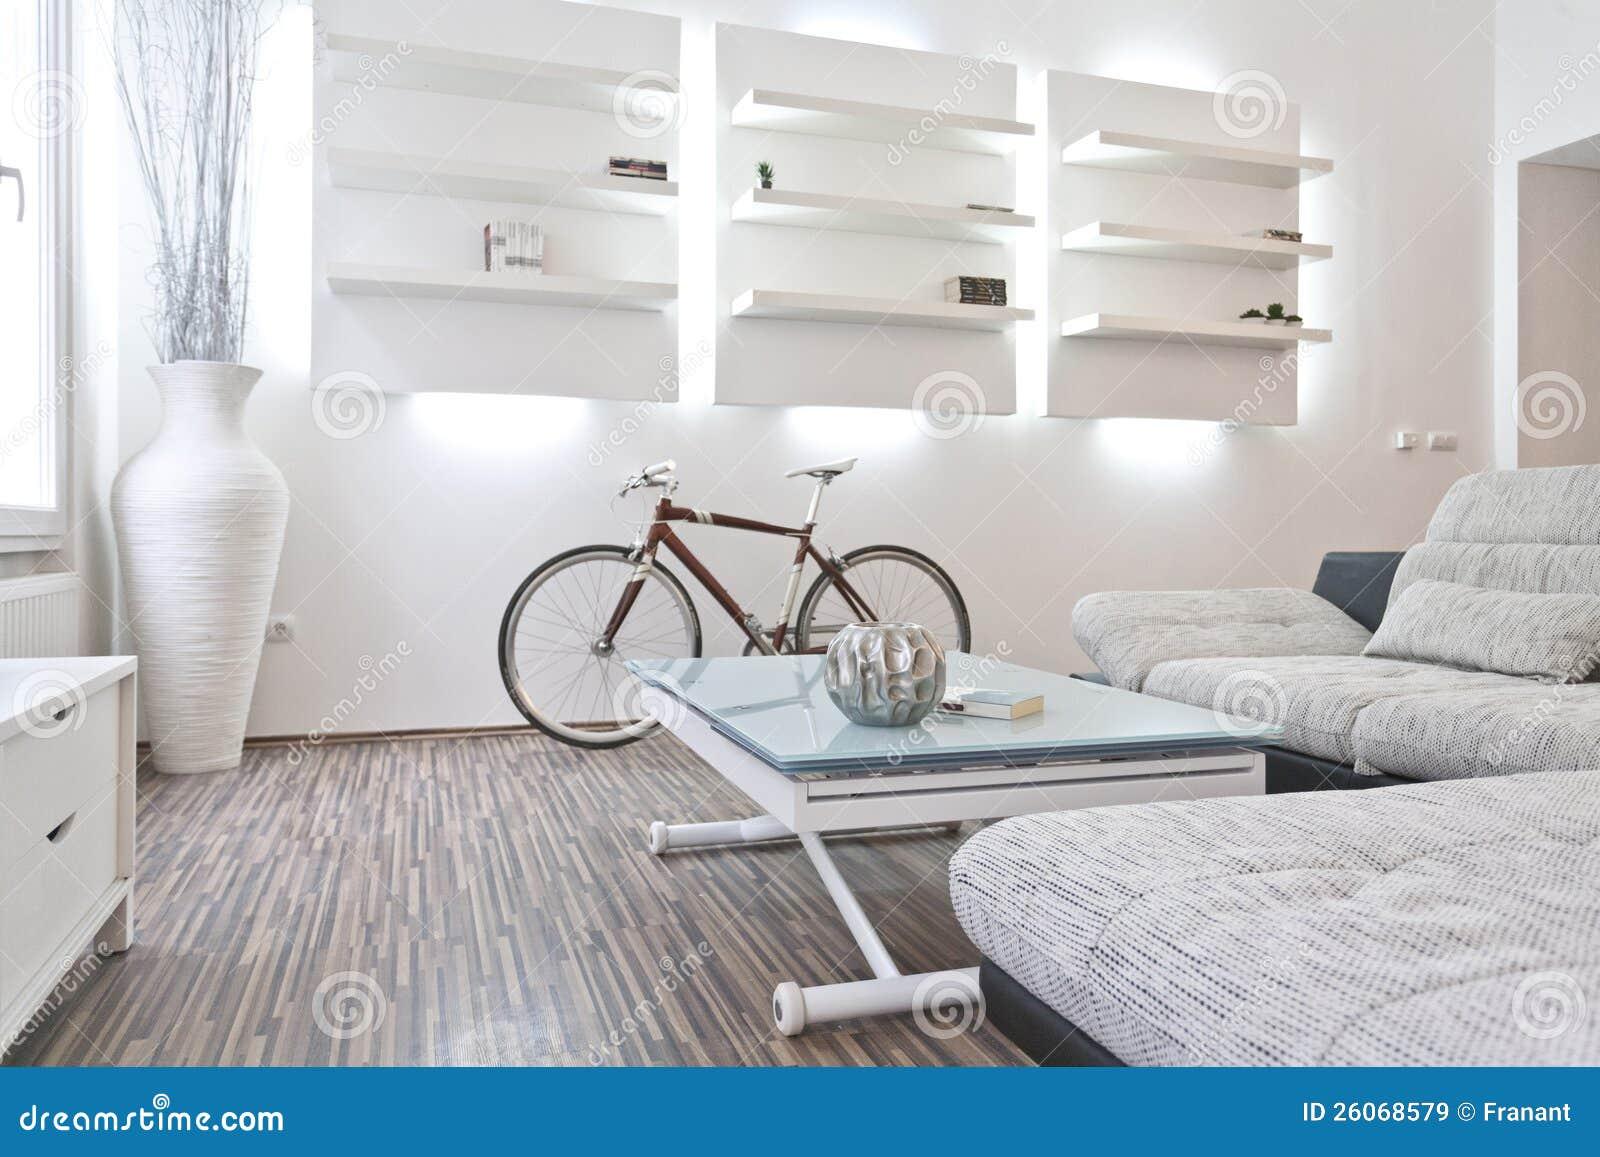 Living room interior design royalty free stock images for Hi tech living room designs